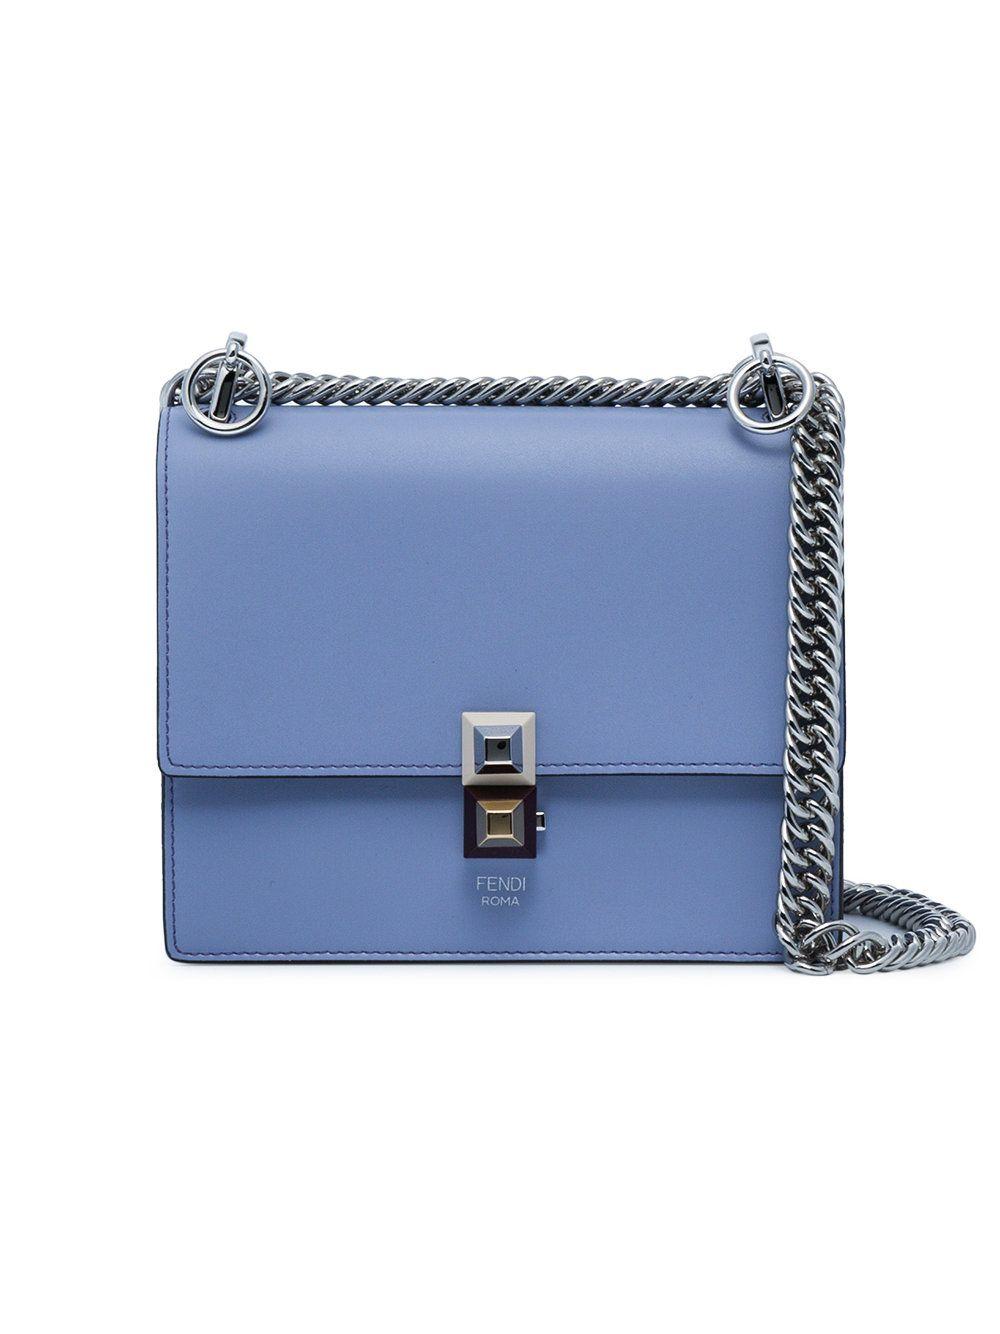 36ed1d871b Fendi Blue Kan I Small Leather Shoulder Bag